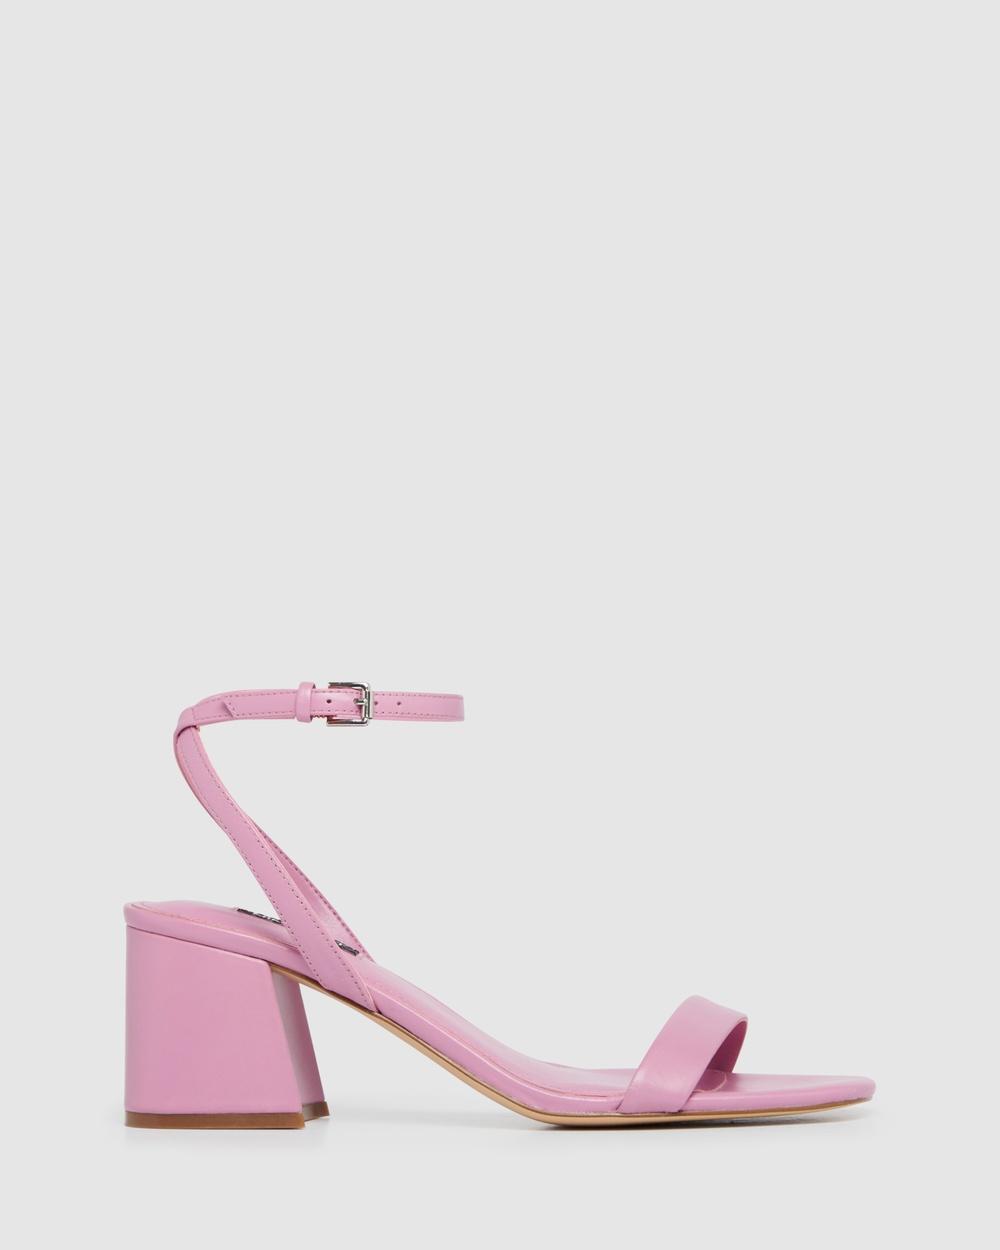 Nine West Giada Sandals DARK PINK Australia